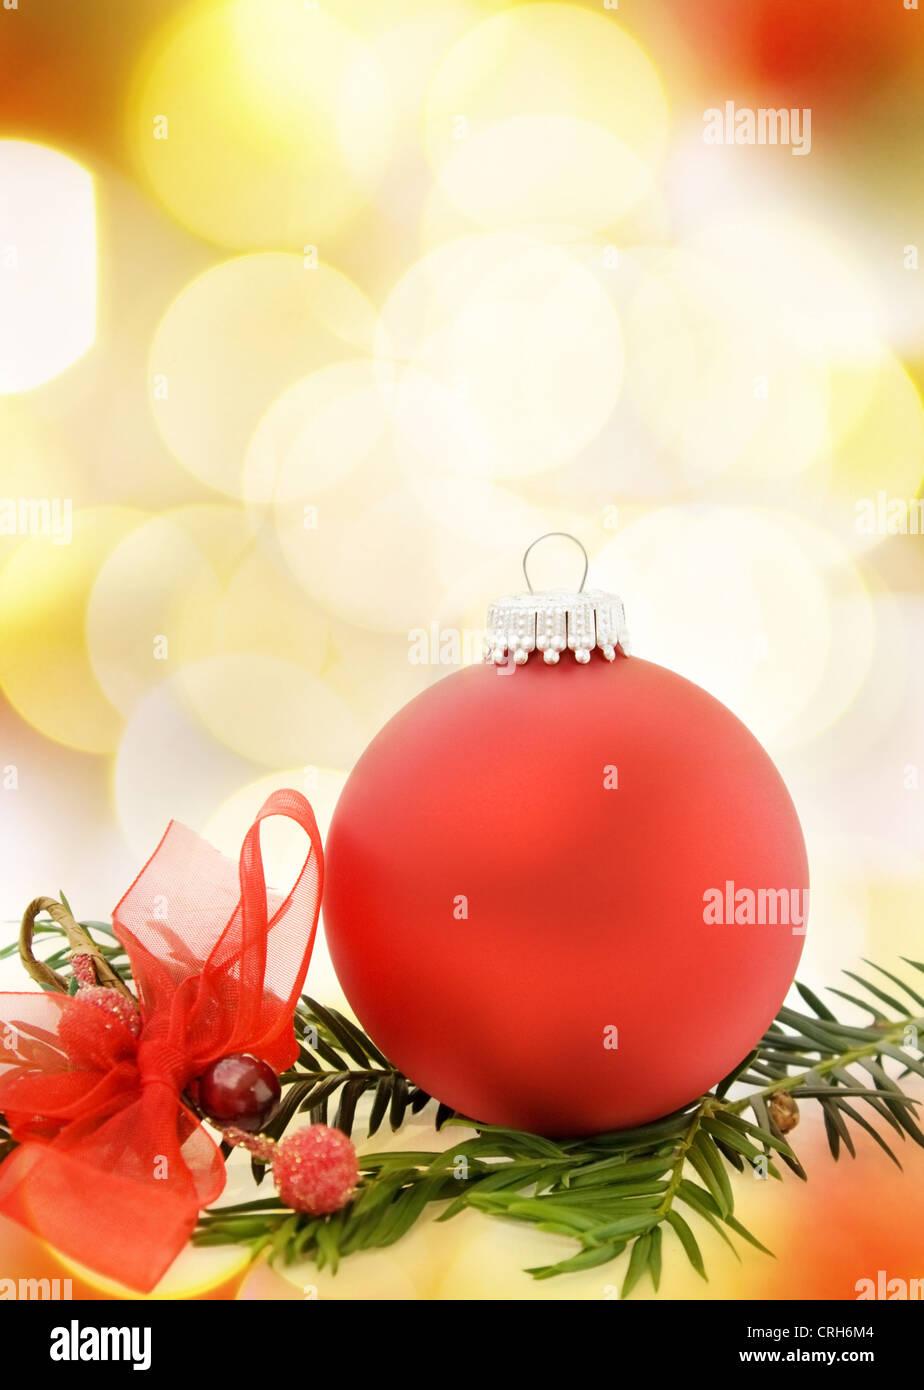 Christmas Magic Stock Photos & Christmas Magic Stock ...